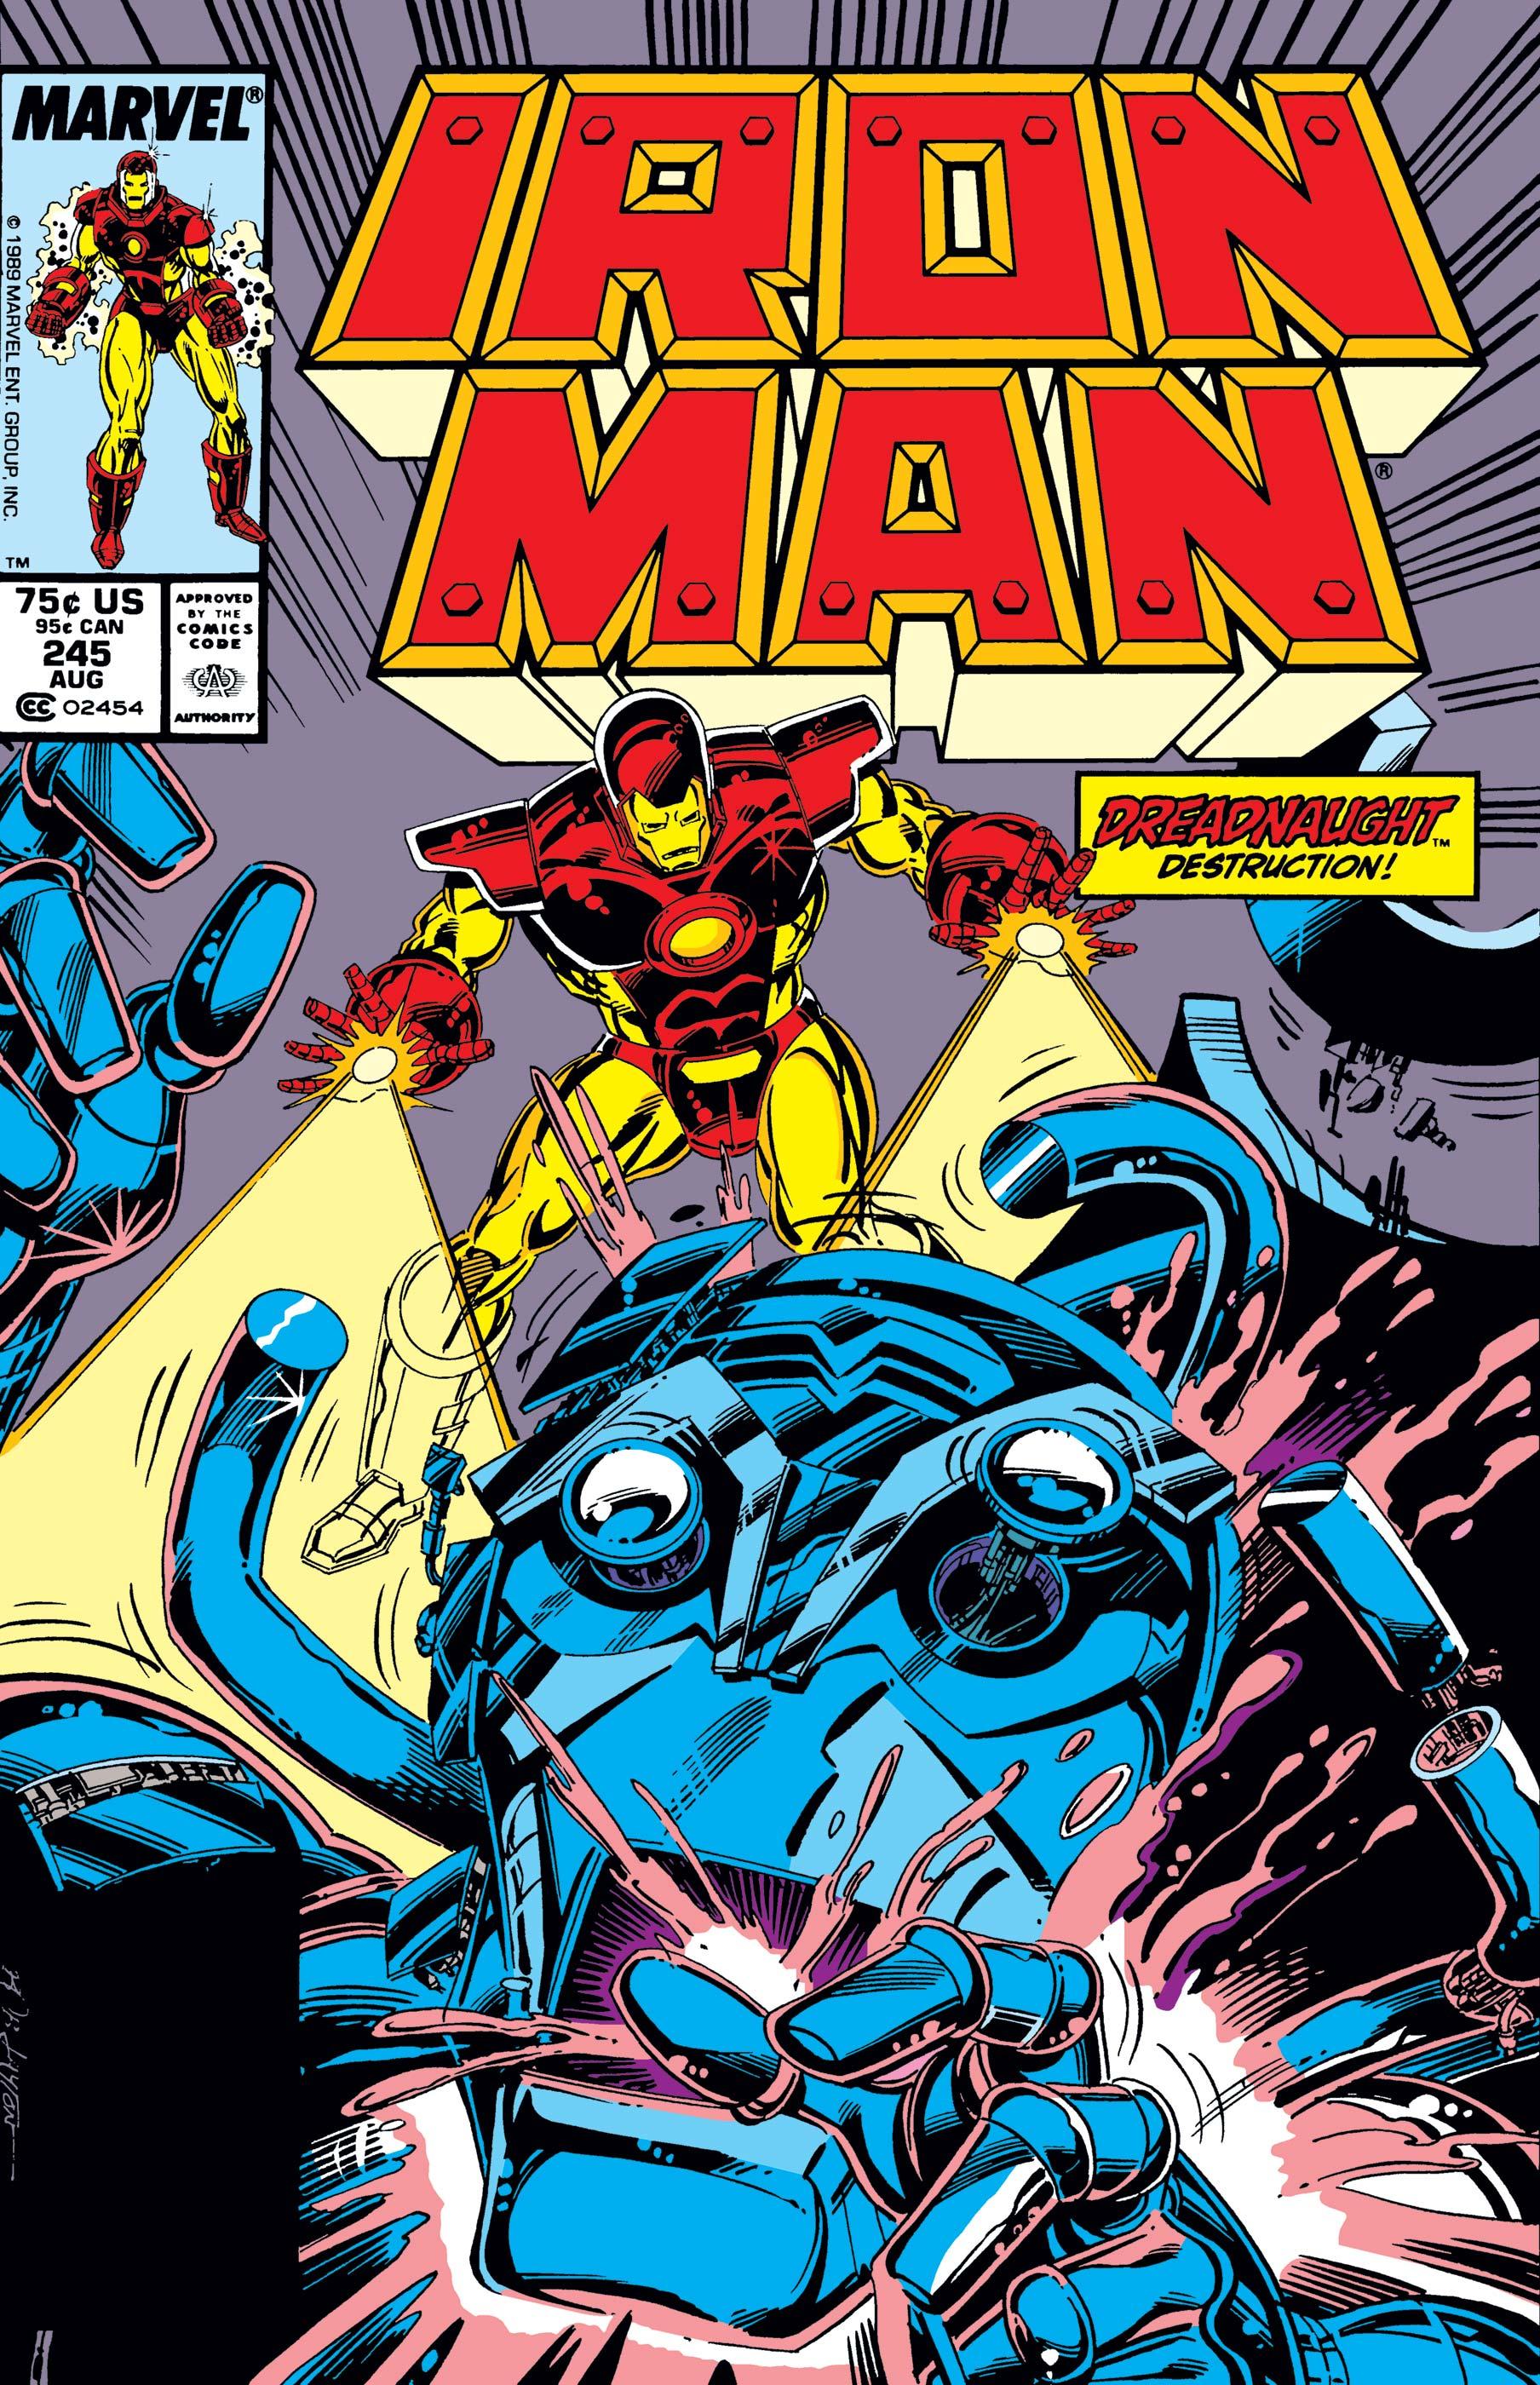 Iron Man (1968) #245